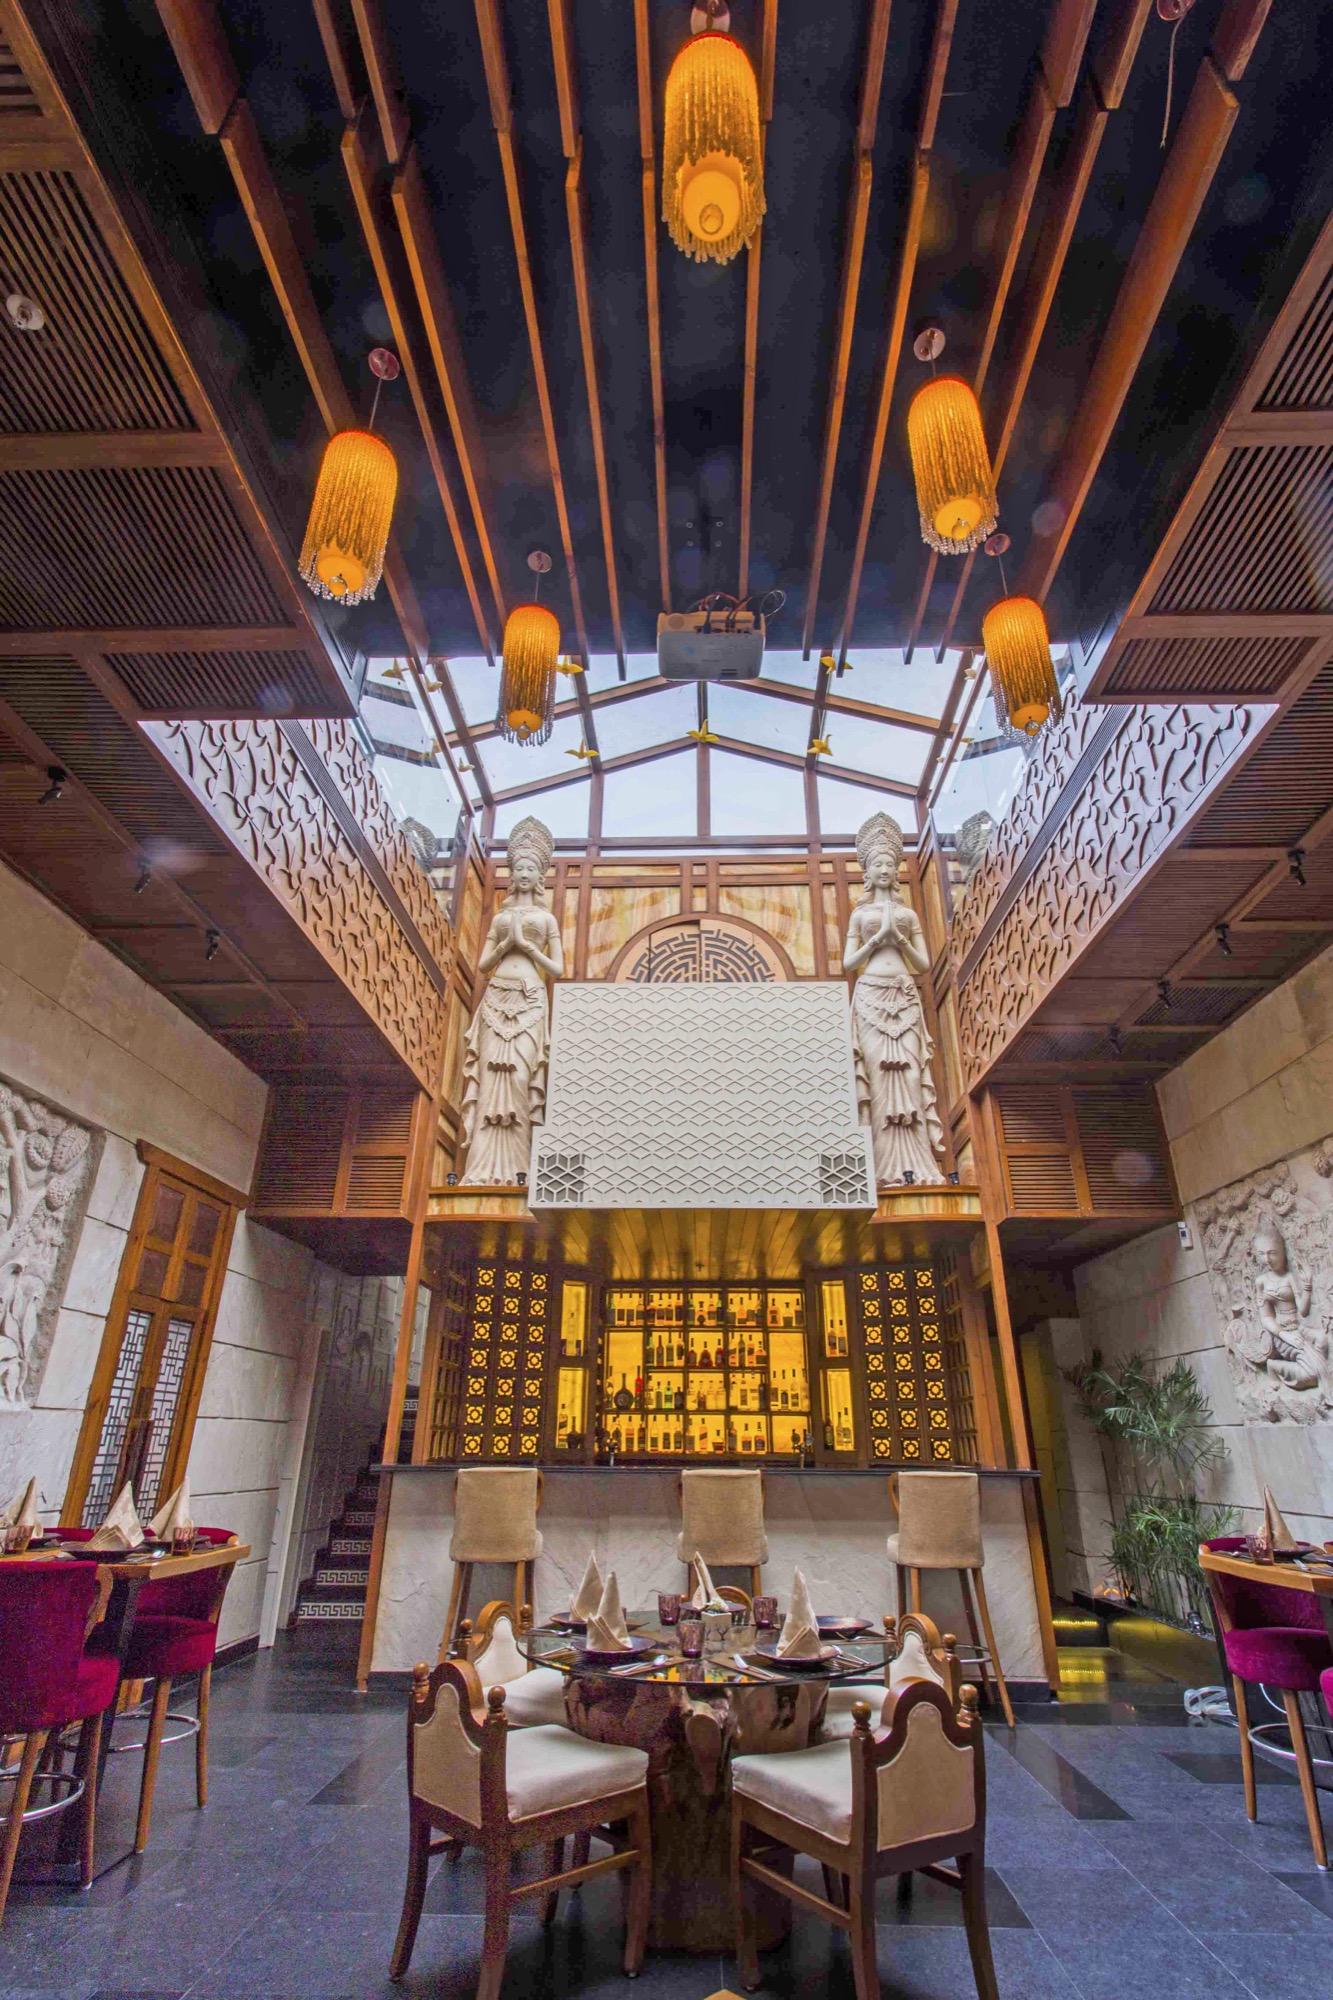 Best of Asia Village, Interior design for a restaurant at Delhi by Aspire Designs 7